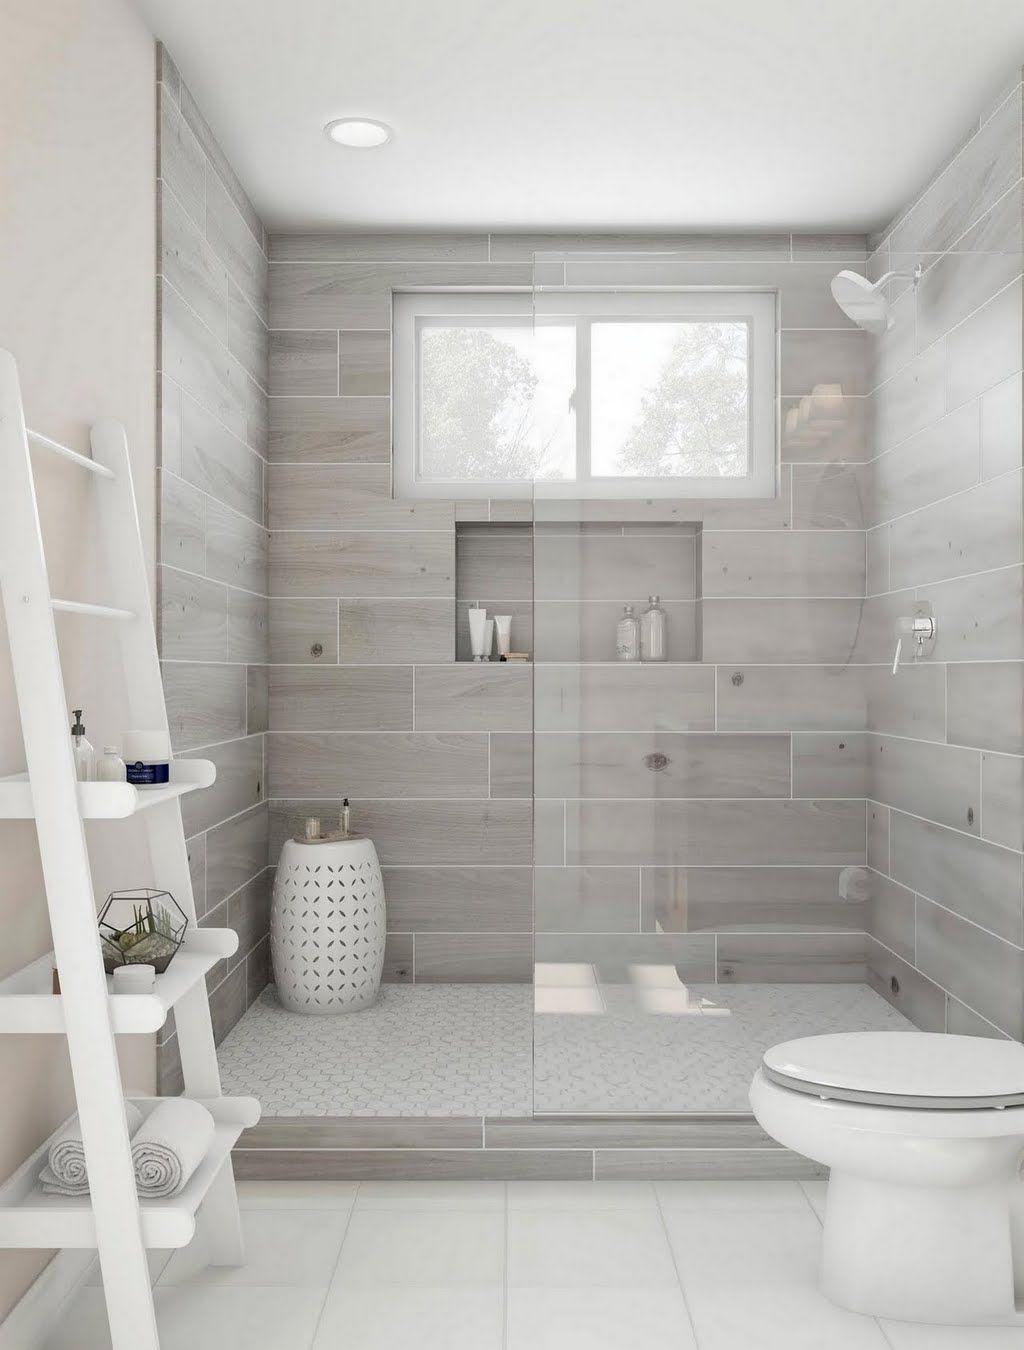 30 Excellent Bathroom Design Ideas You Should Have Bathroom Remodel Shower Bathroom Remodel Master Small Bathroom Remodel